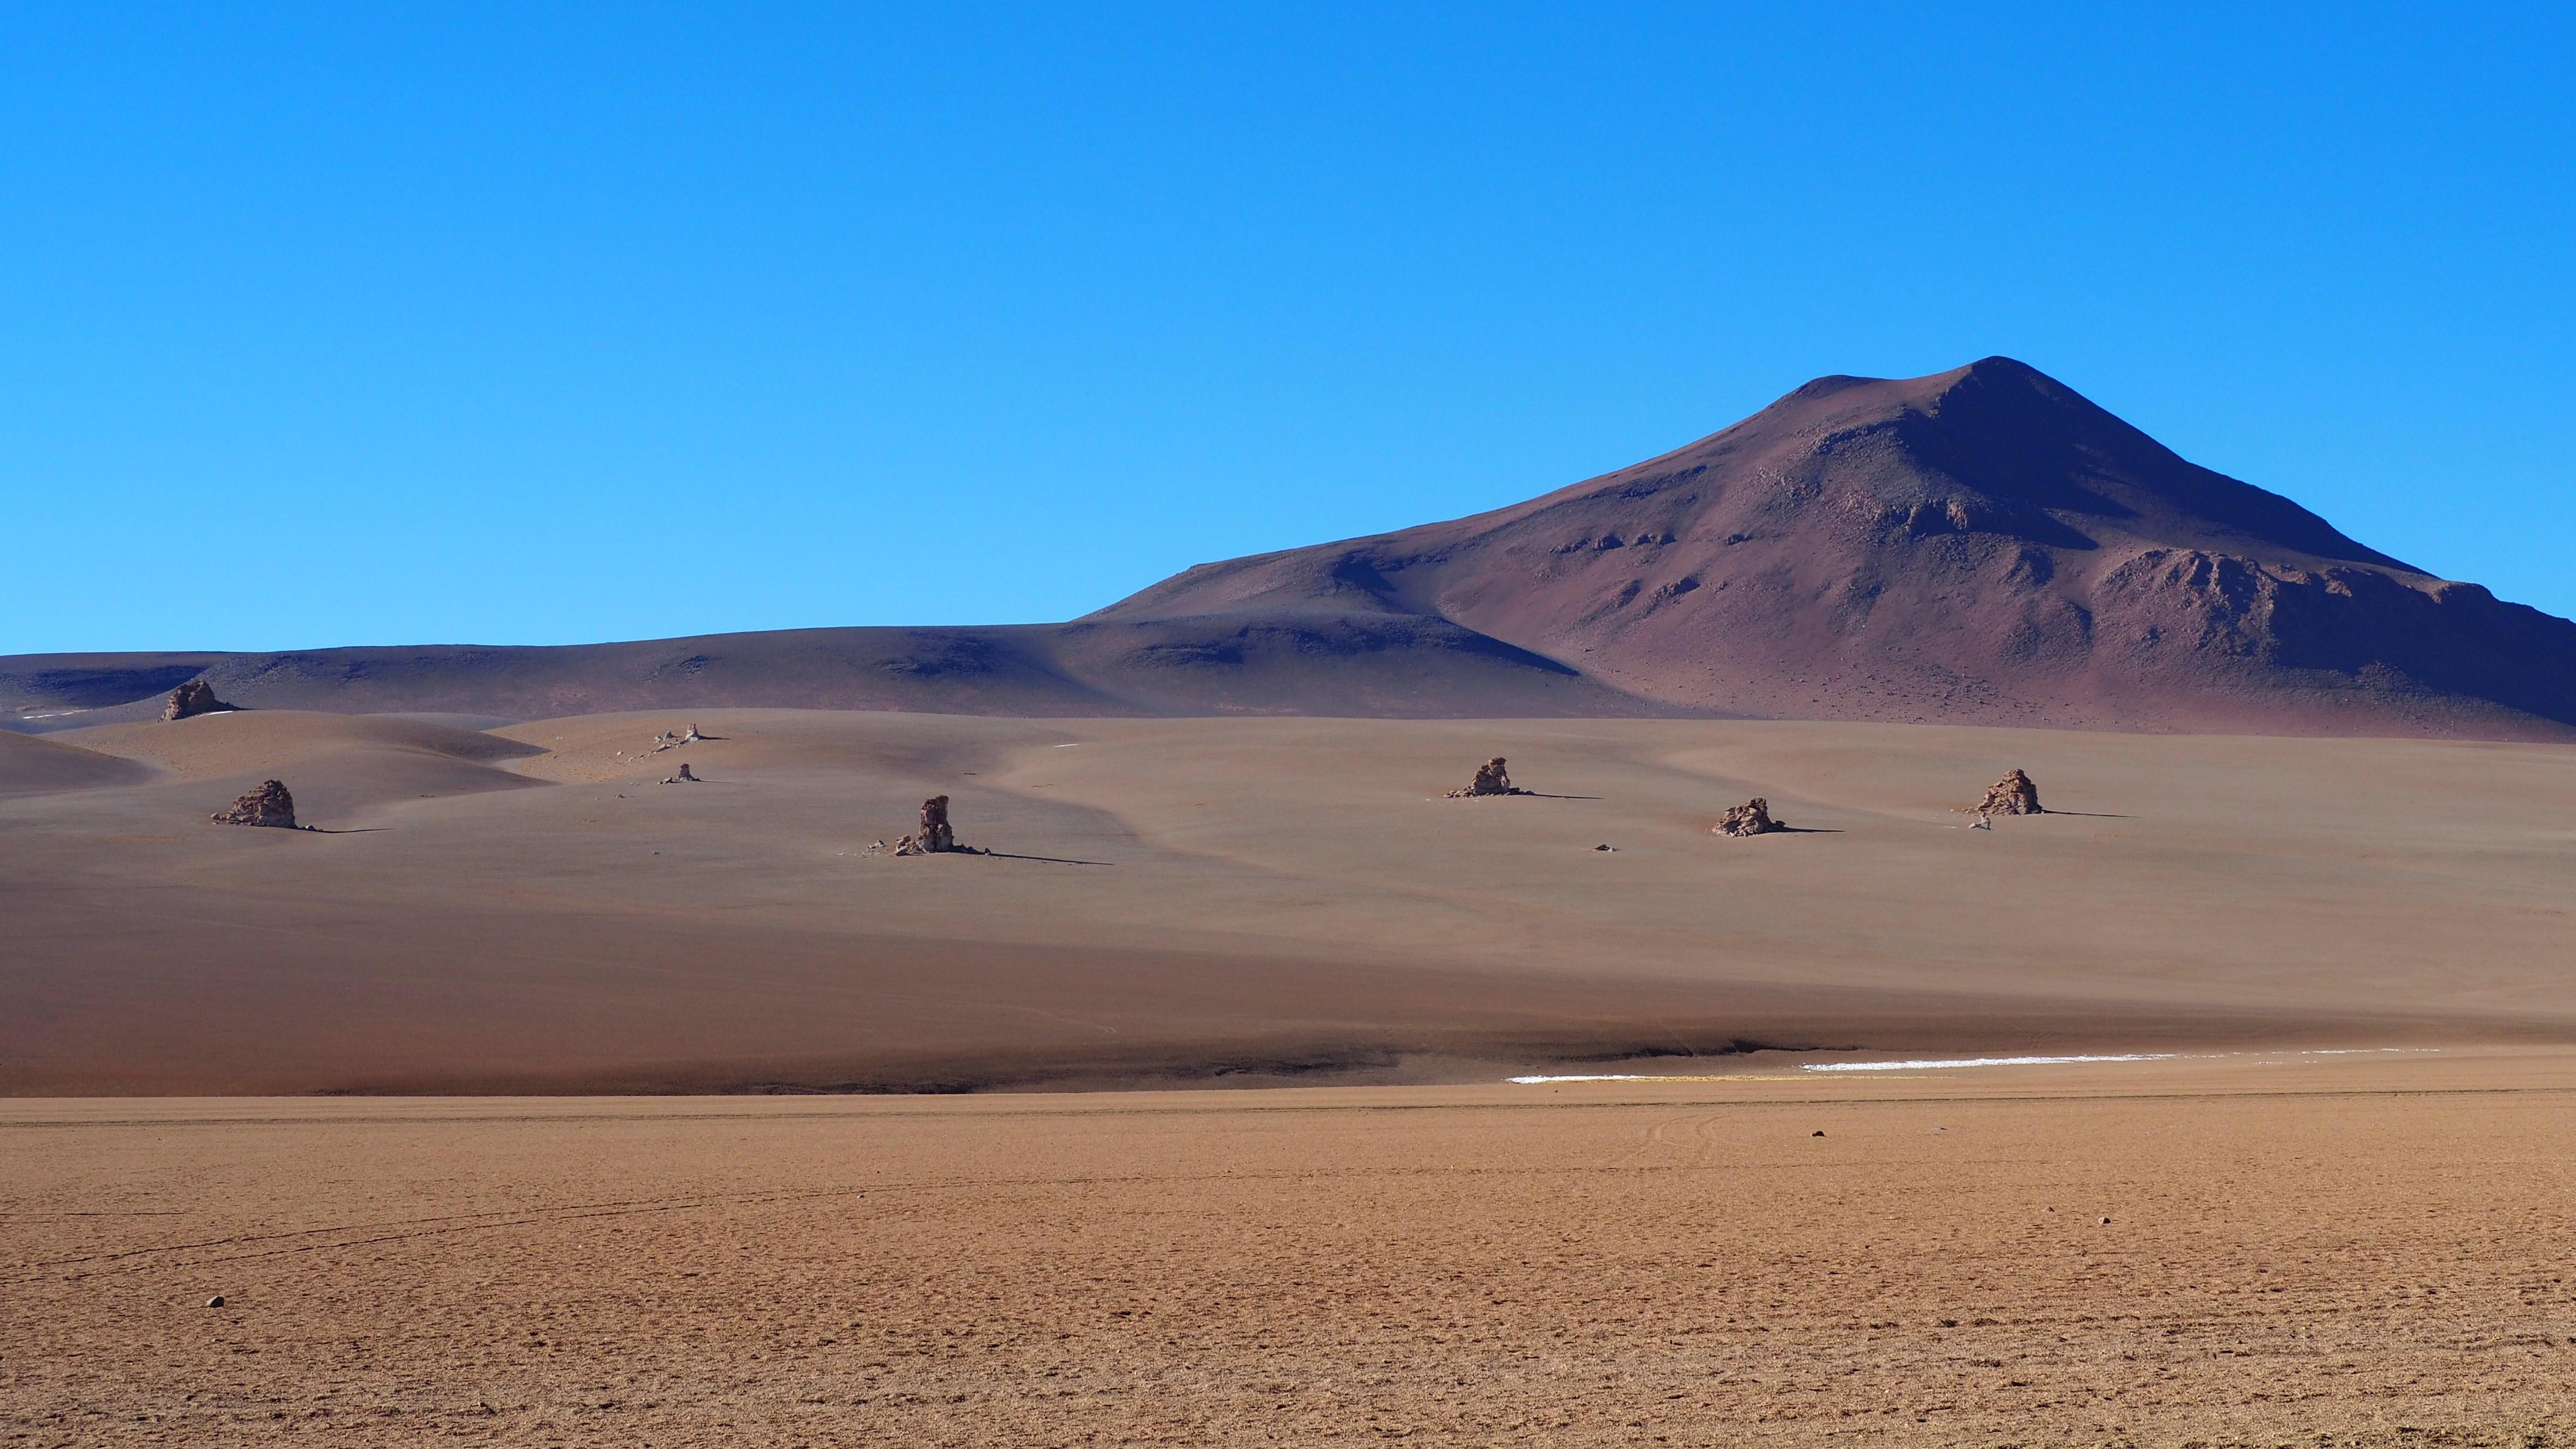 Salvador Dalí desert